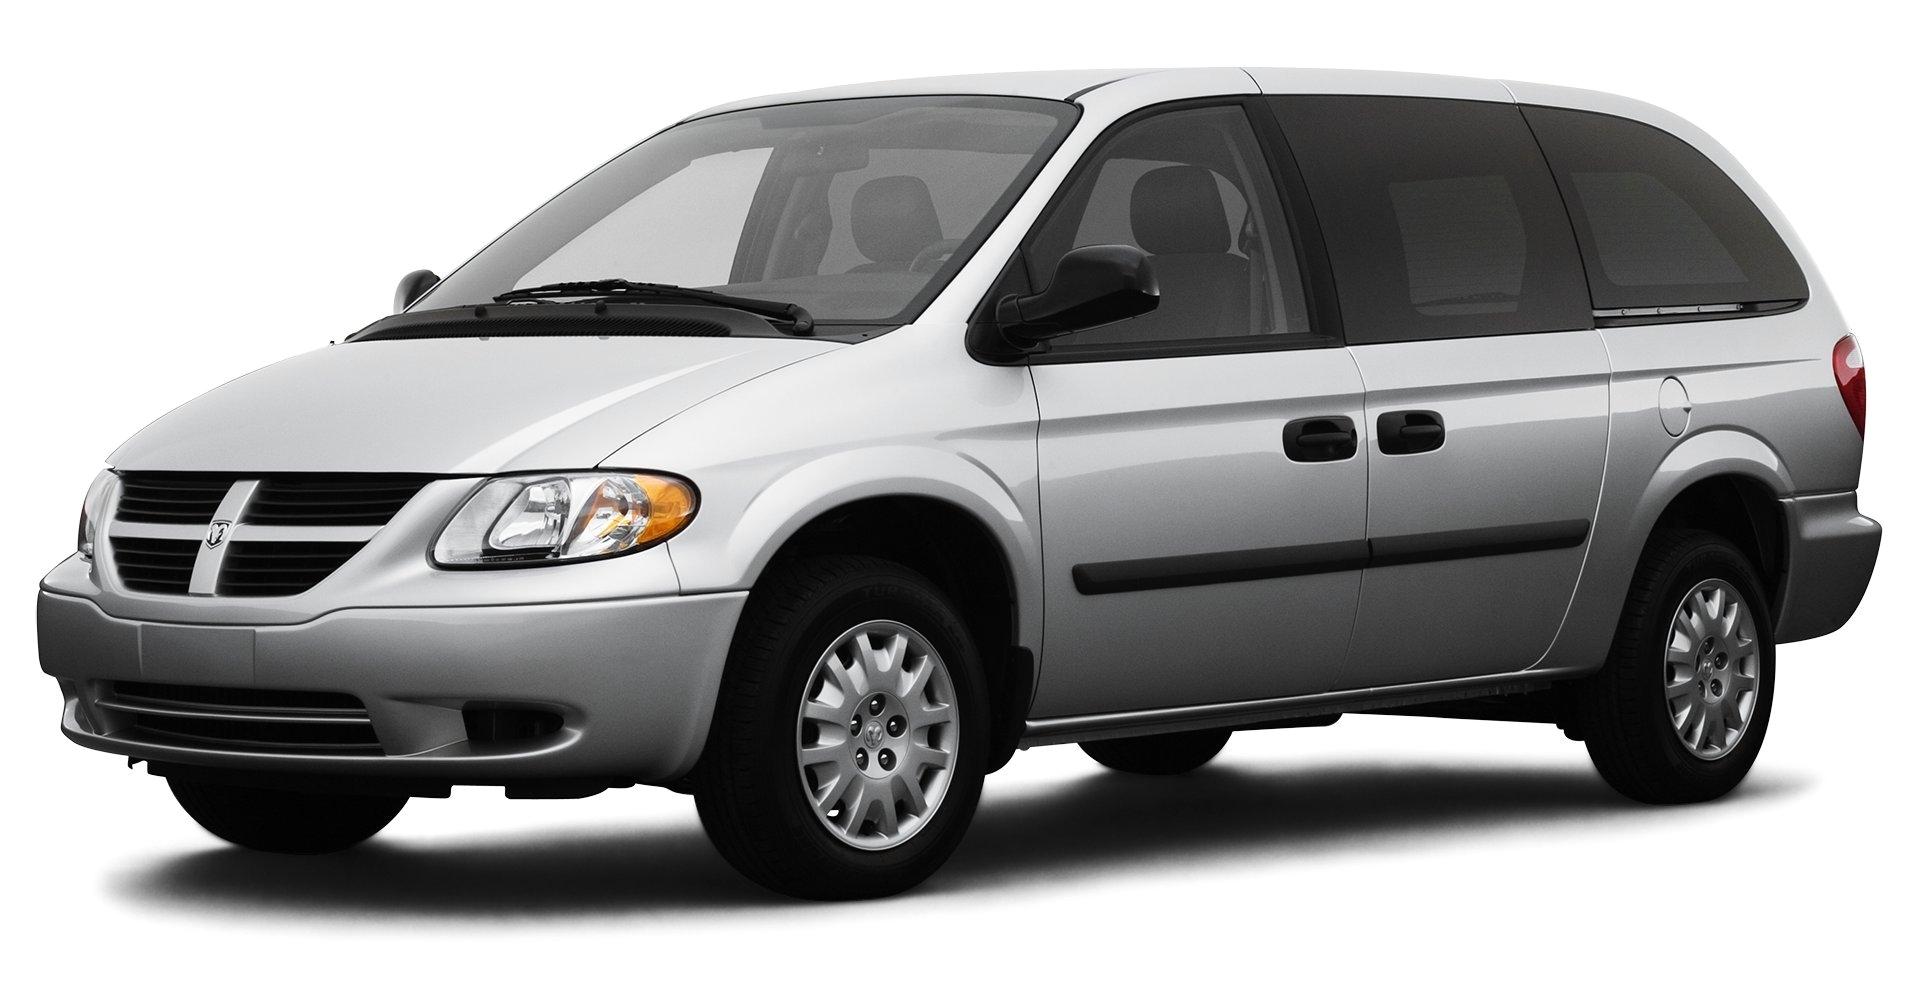 2007 dodge grand caravan grand 119 limited availability